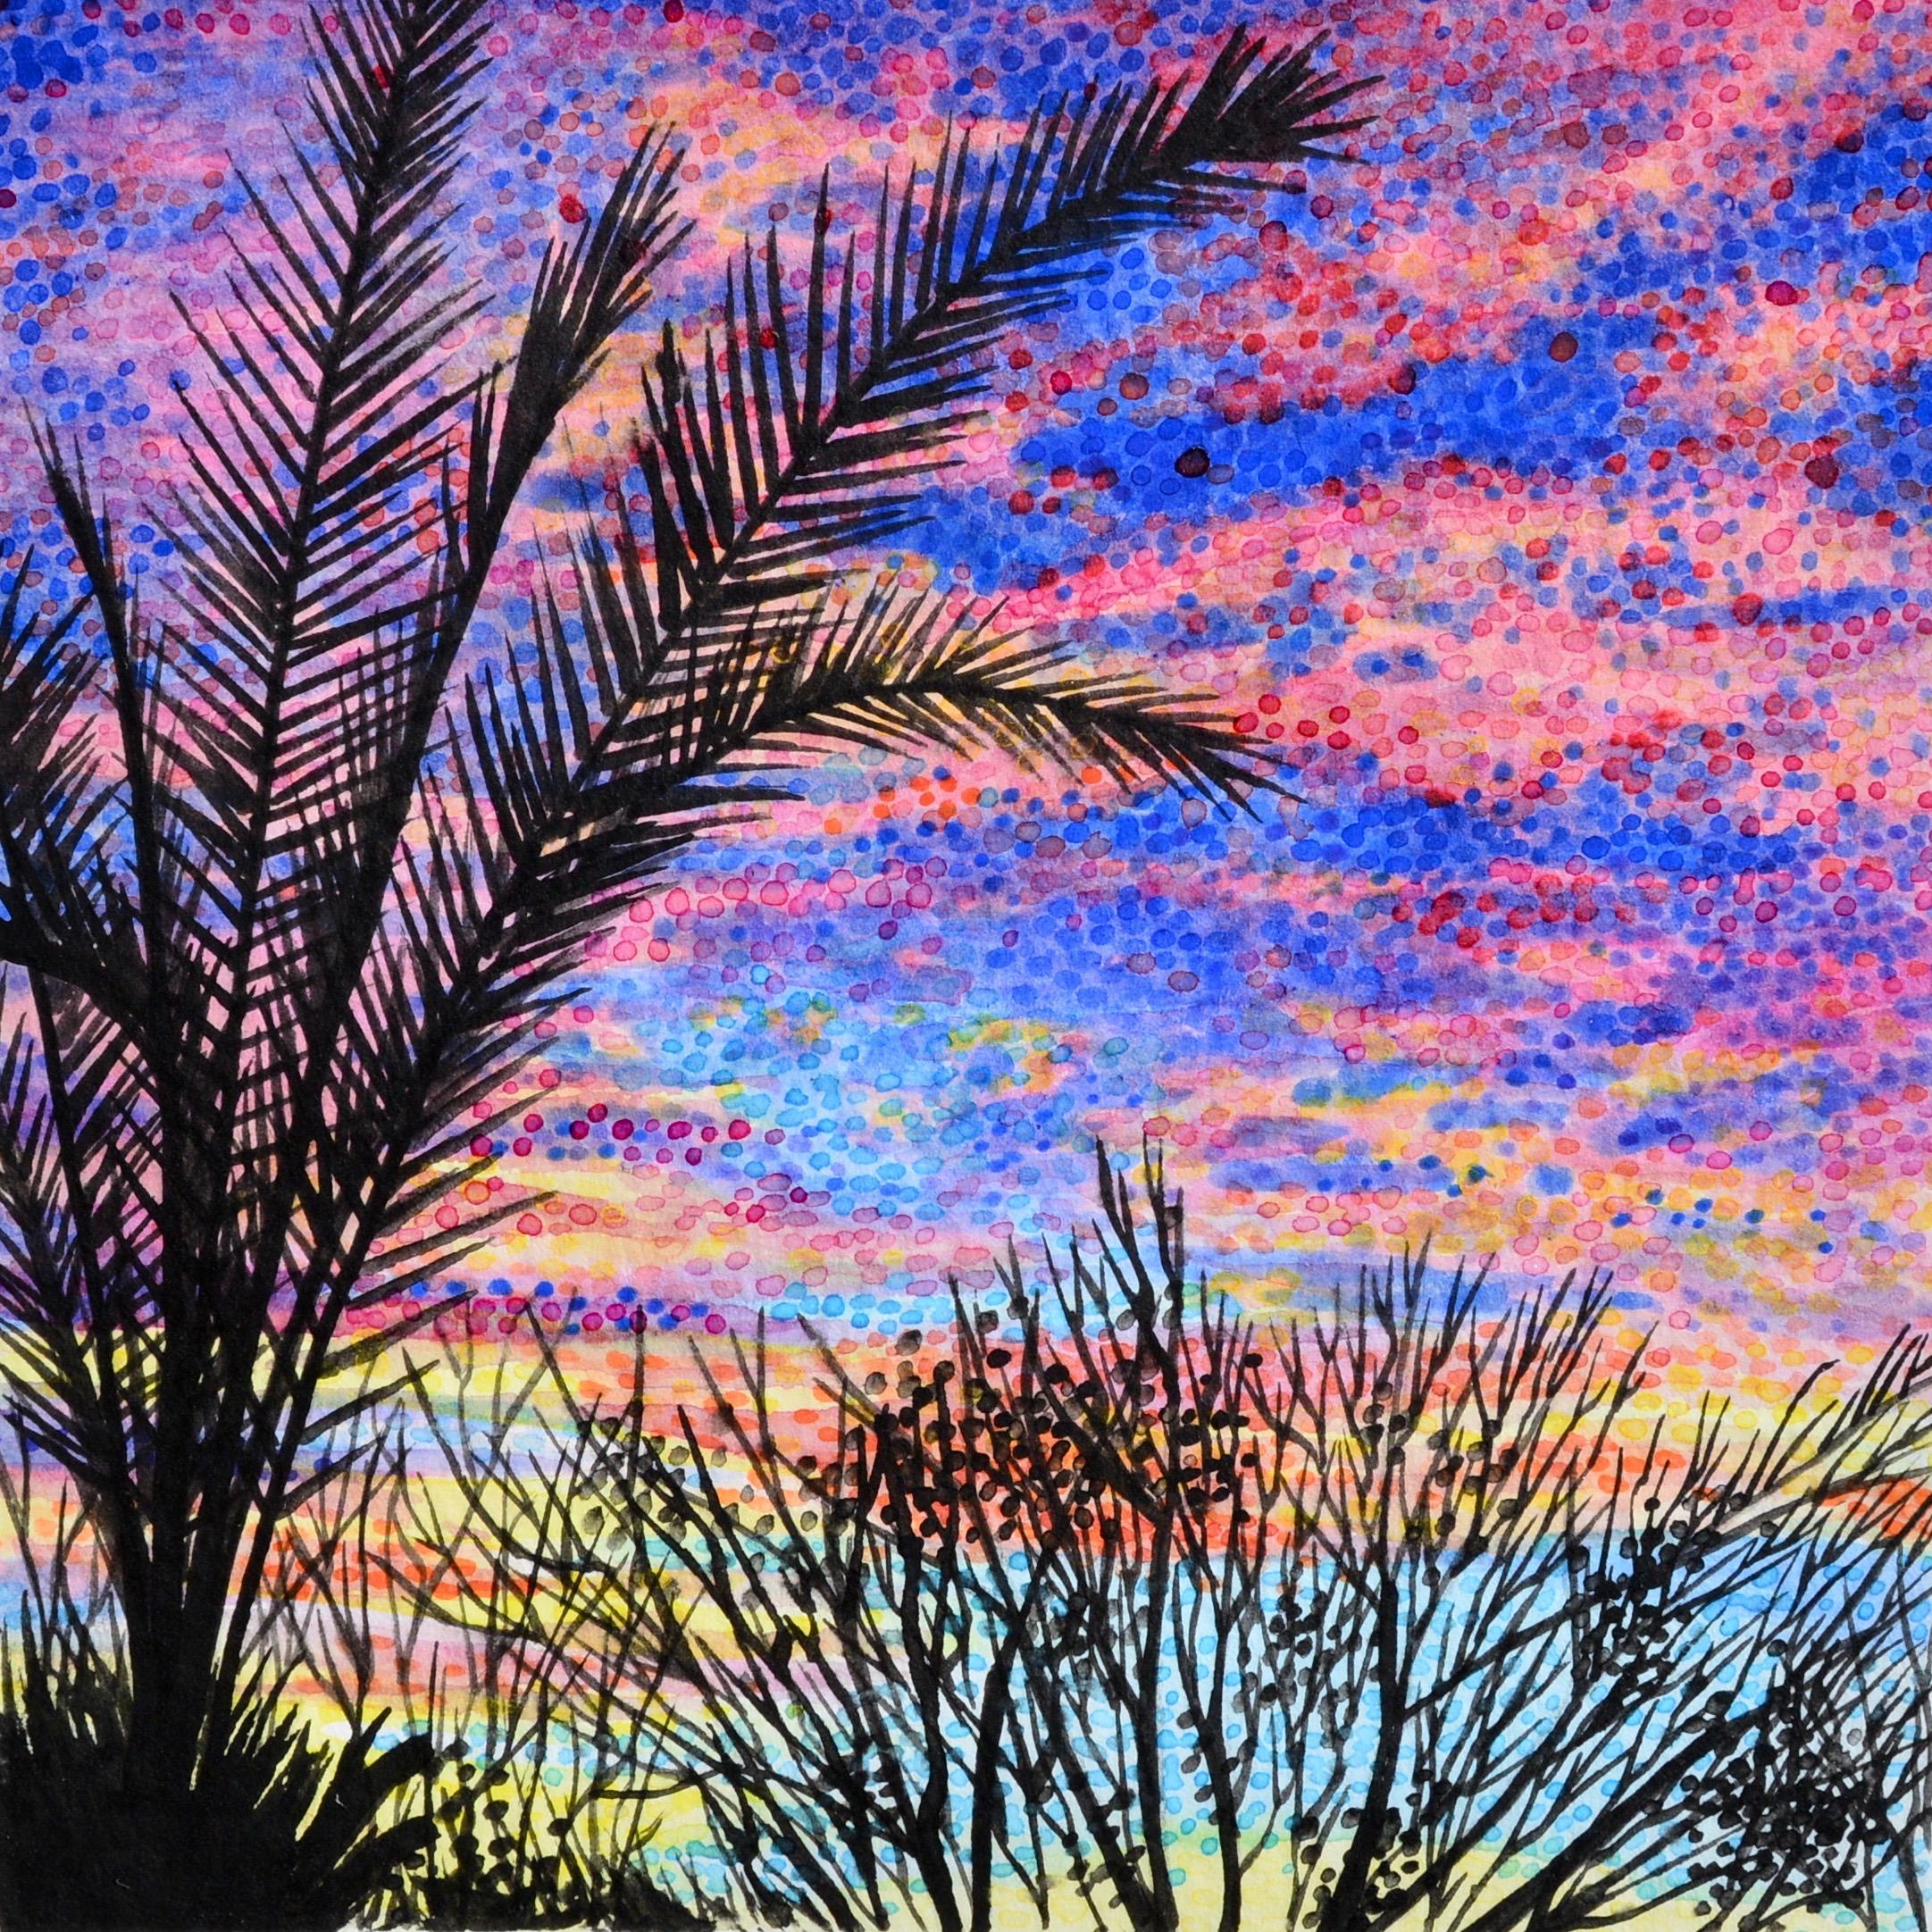 Casas Adobes, Arizona: 2/10/18, 18:14:26